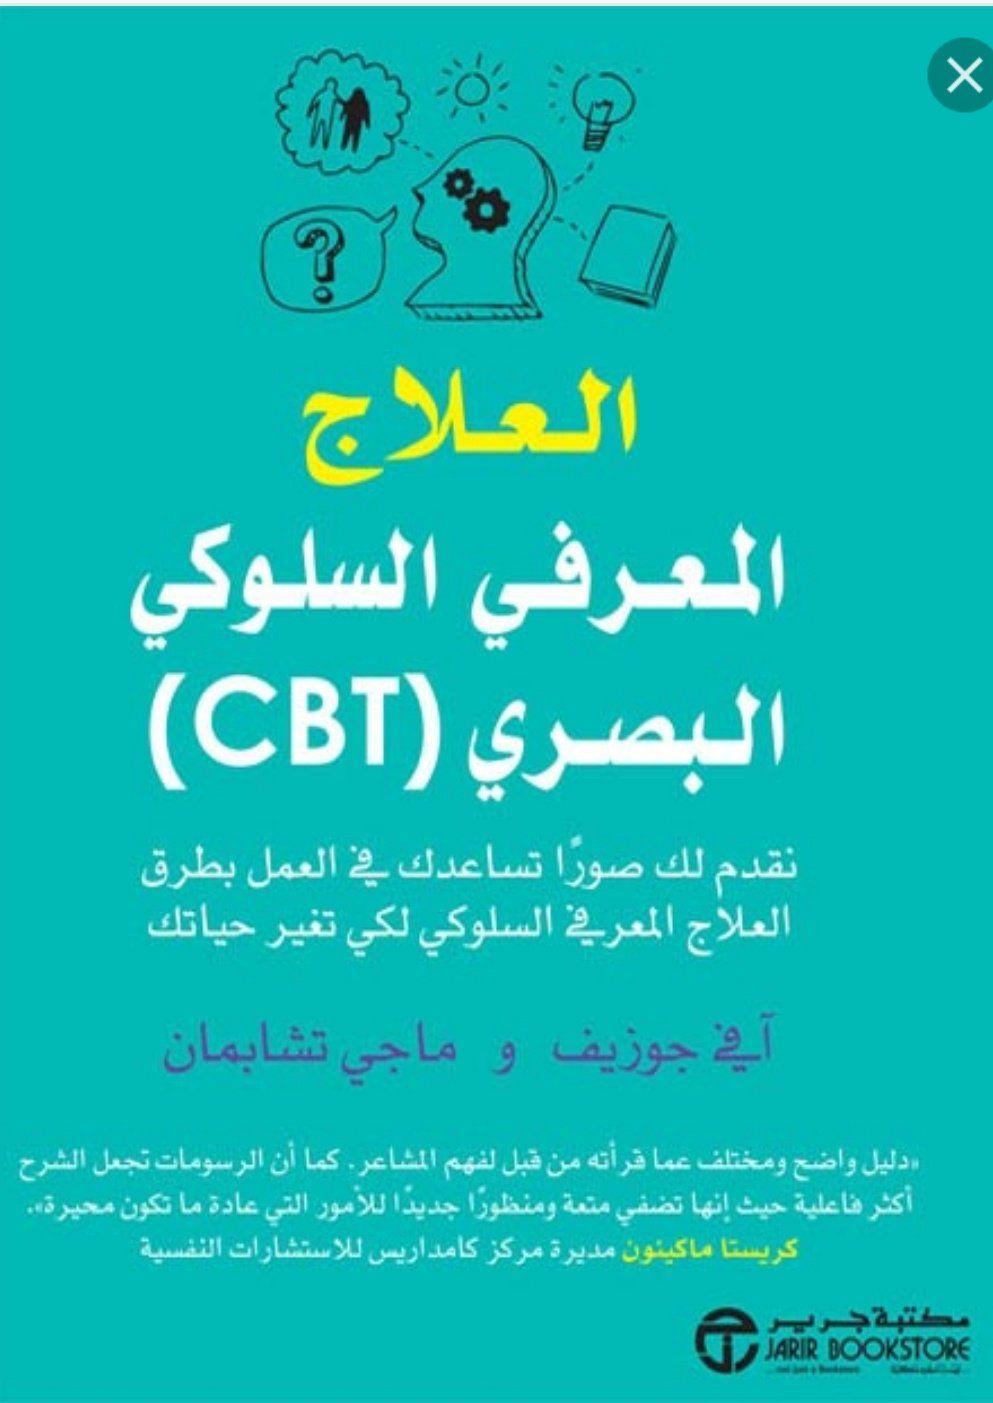 Pin By Najlaa Alhaj On كتب Books Movie Posters Bookstore